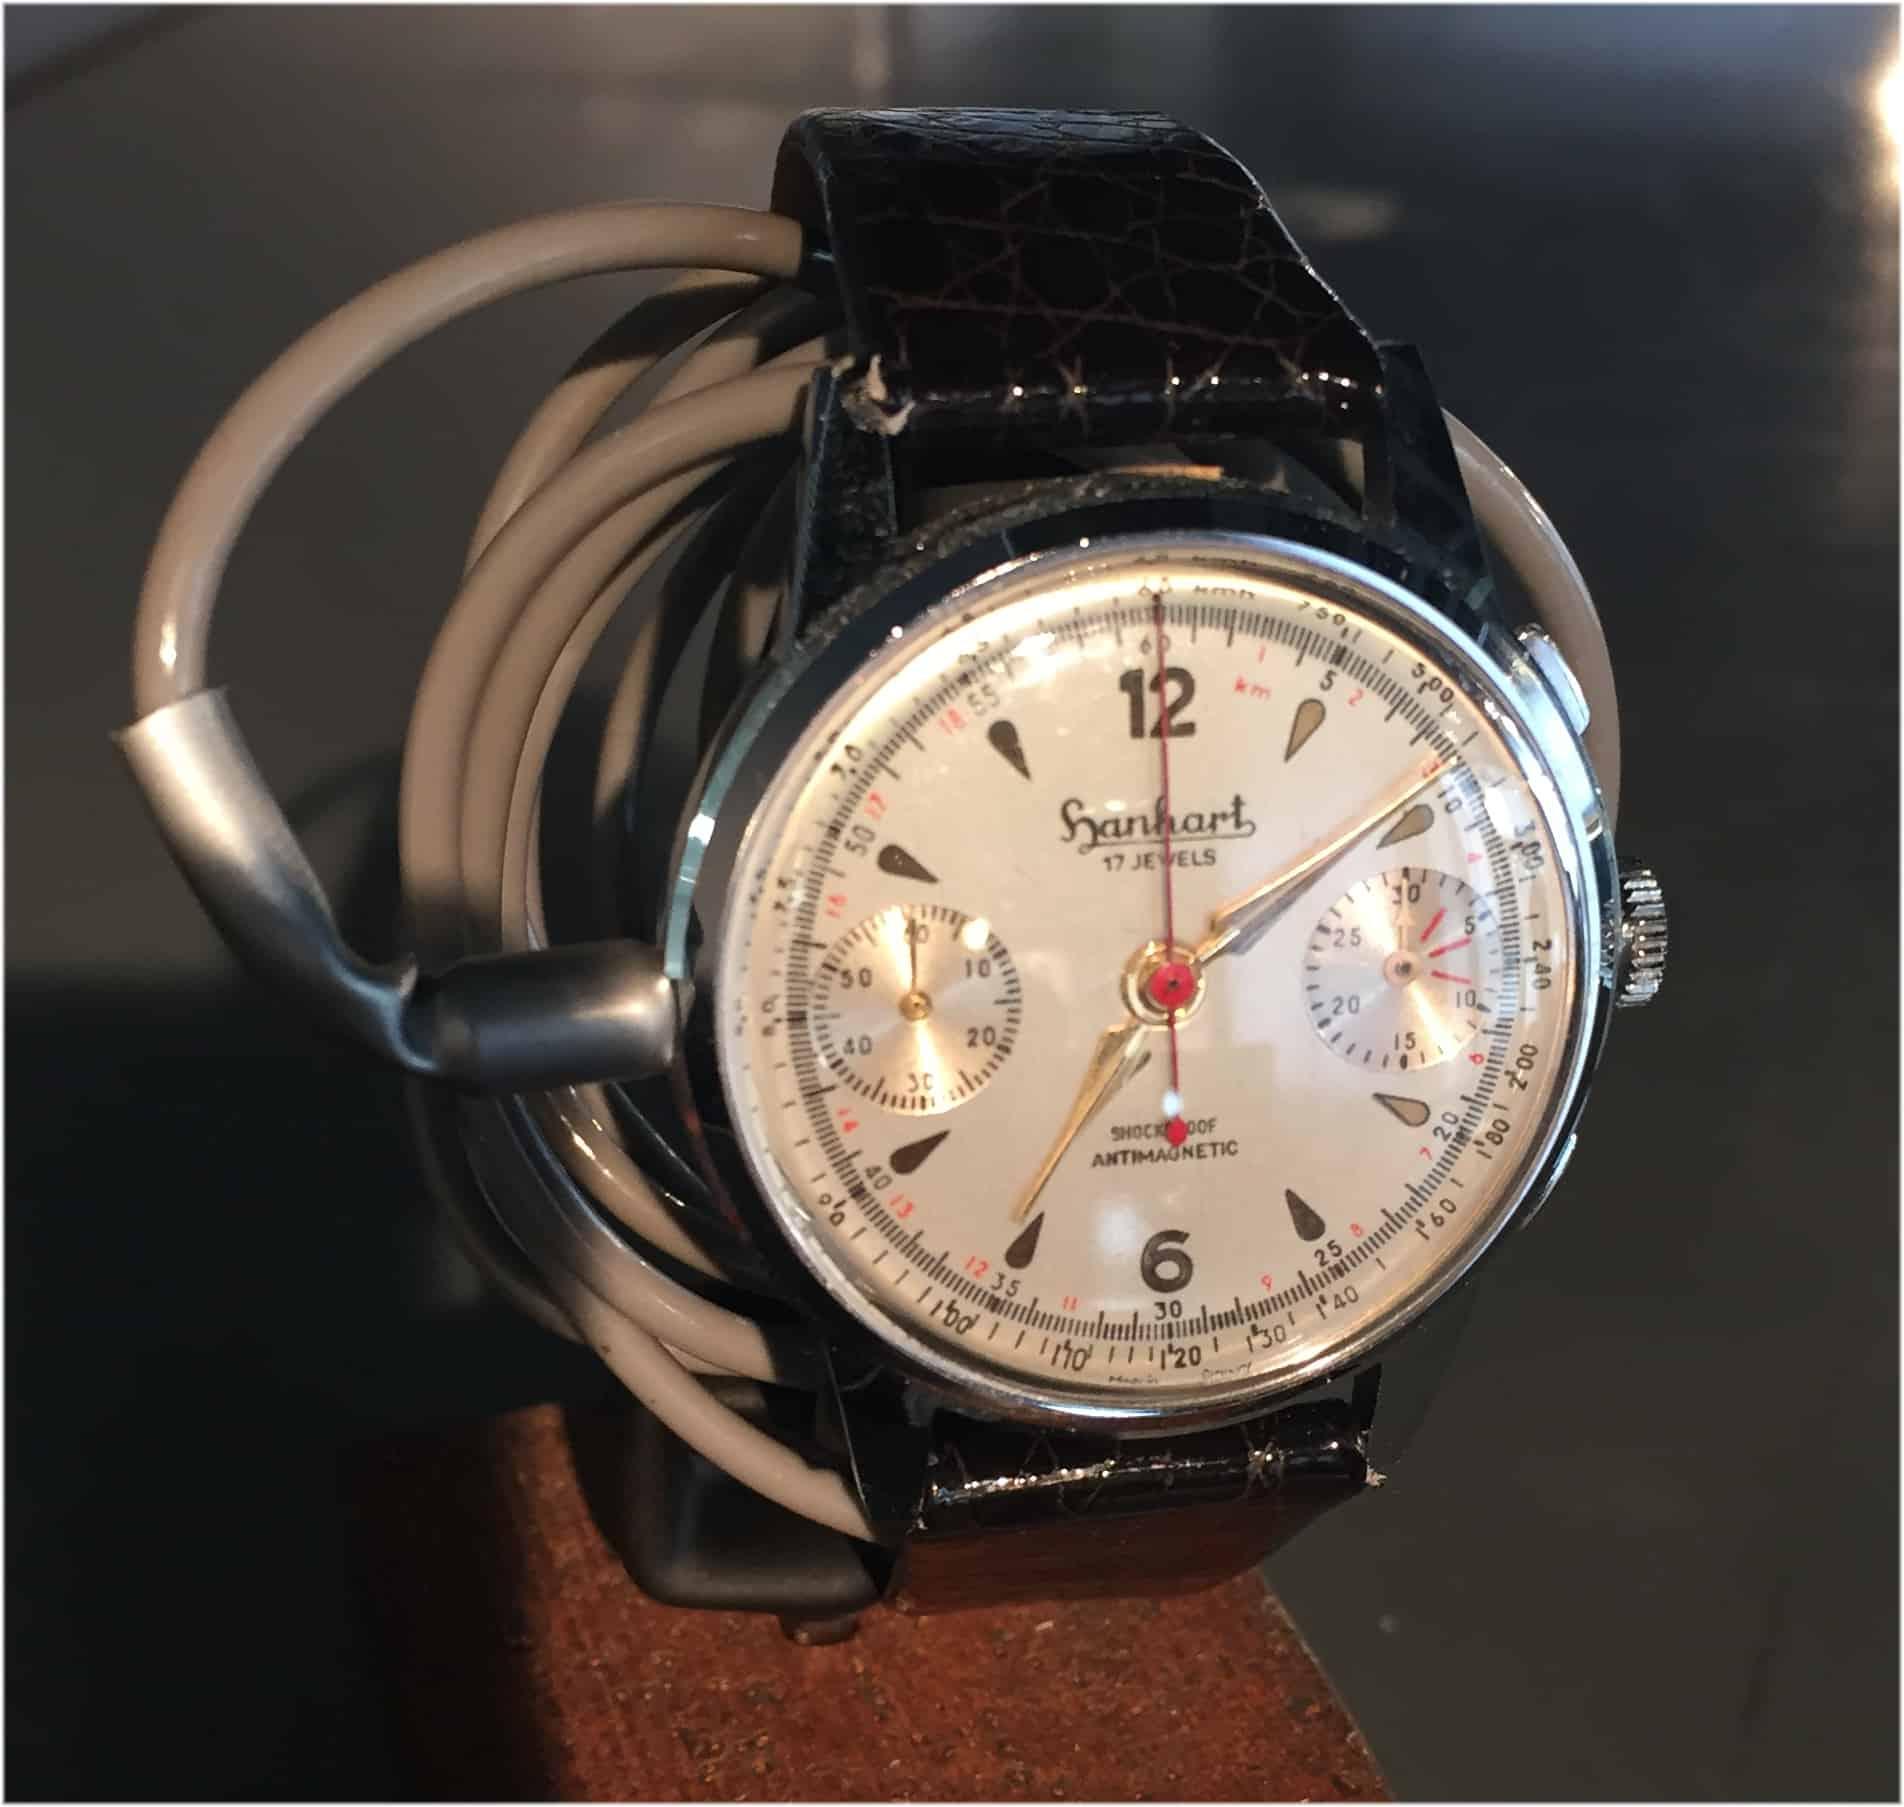 Hanhart Spionage Chronograph mit eingebautem Mikrophon Foto C Uhrenkosmos